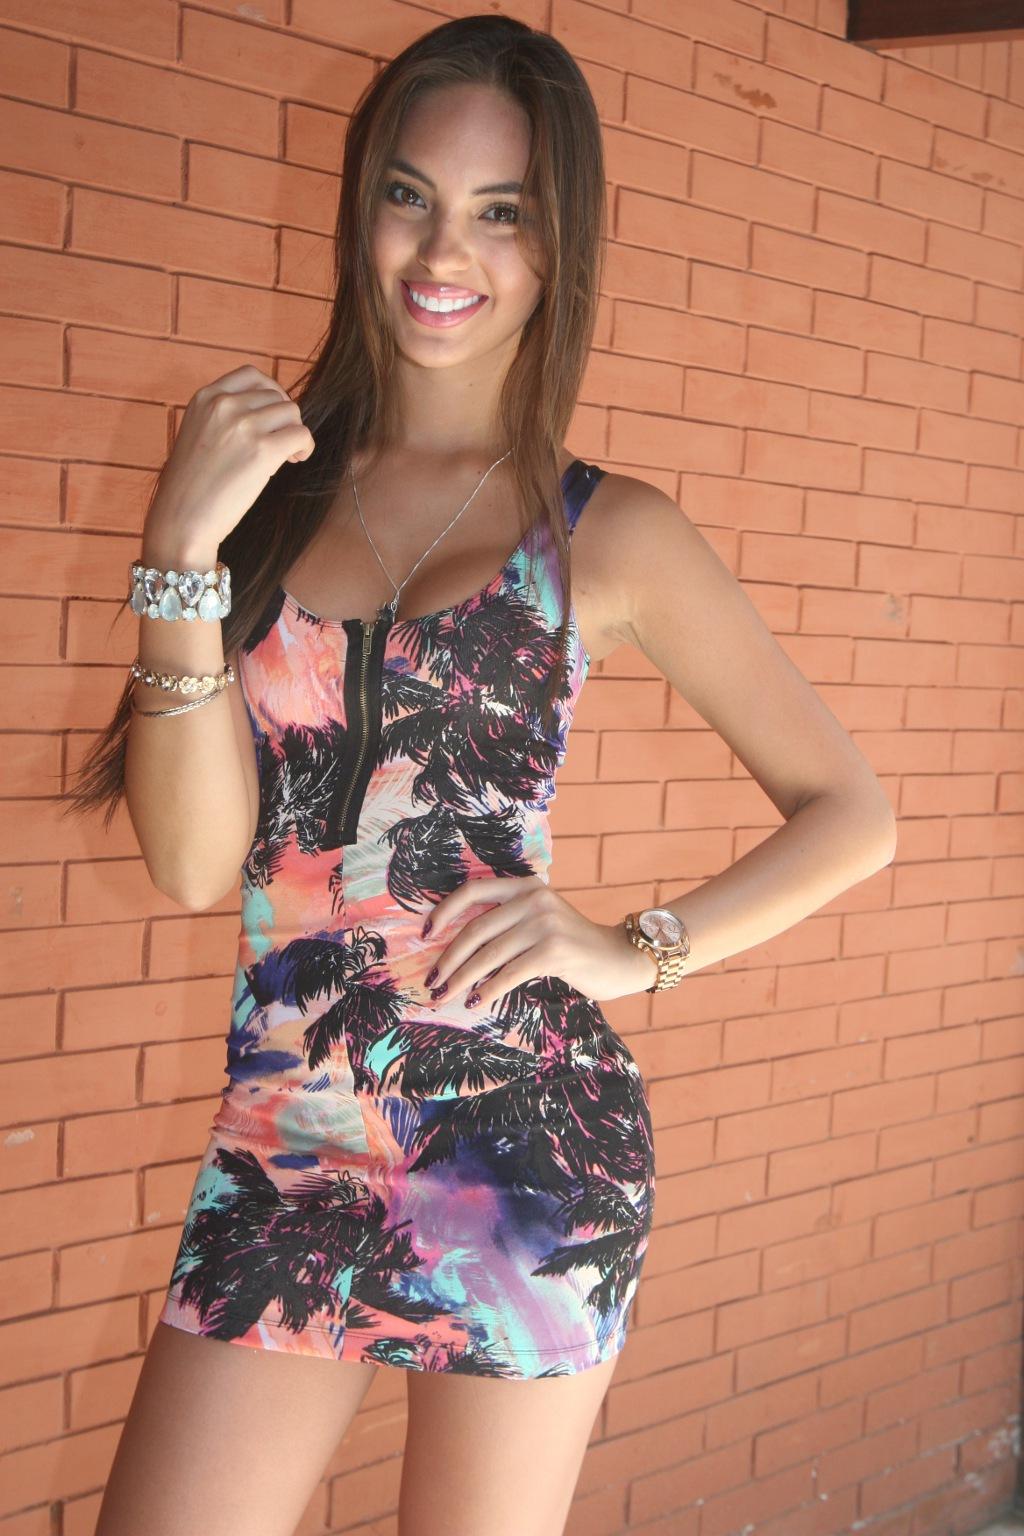 natalie vertiz, miss peru universe 2011. particpo de nb latina 2010 & latin model 2010 (season 3). - Página 3 577924_natalie6_vgd7